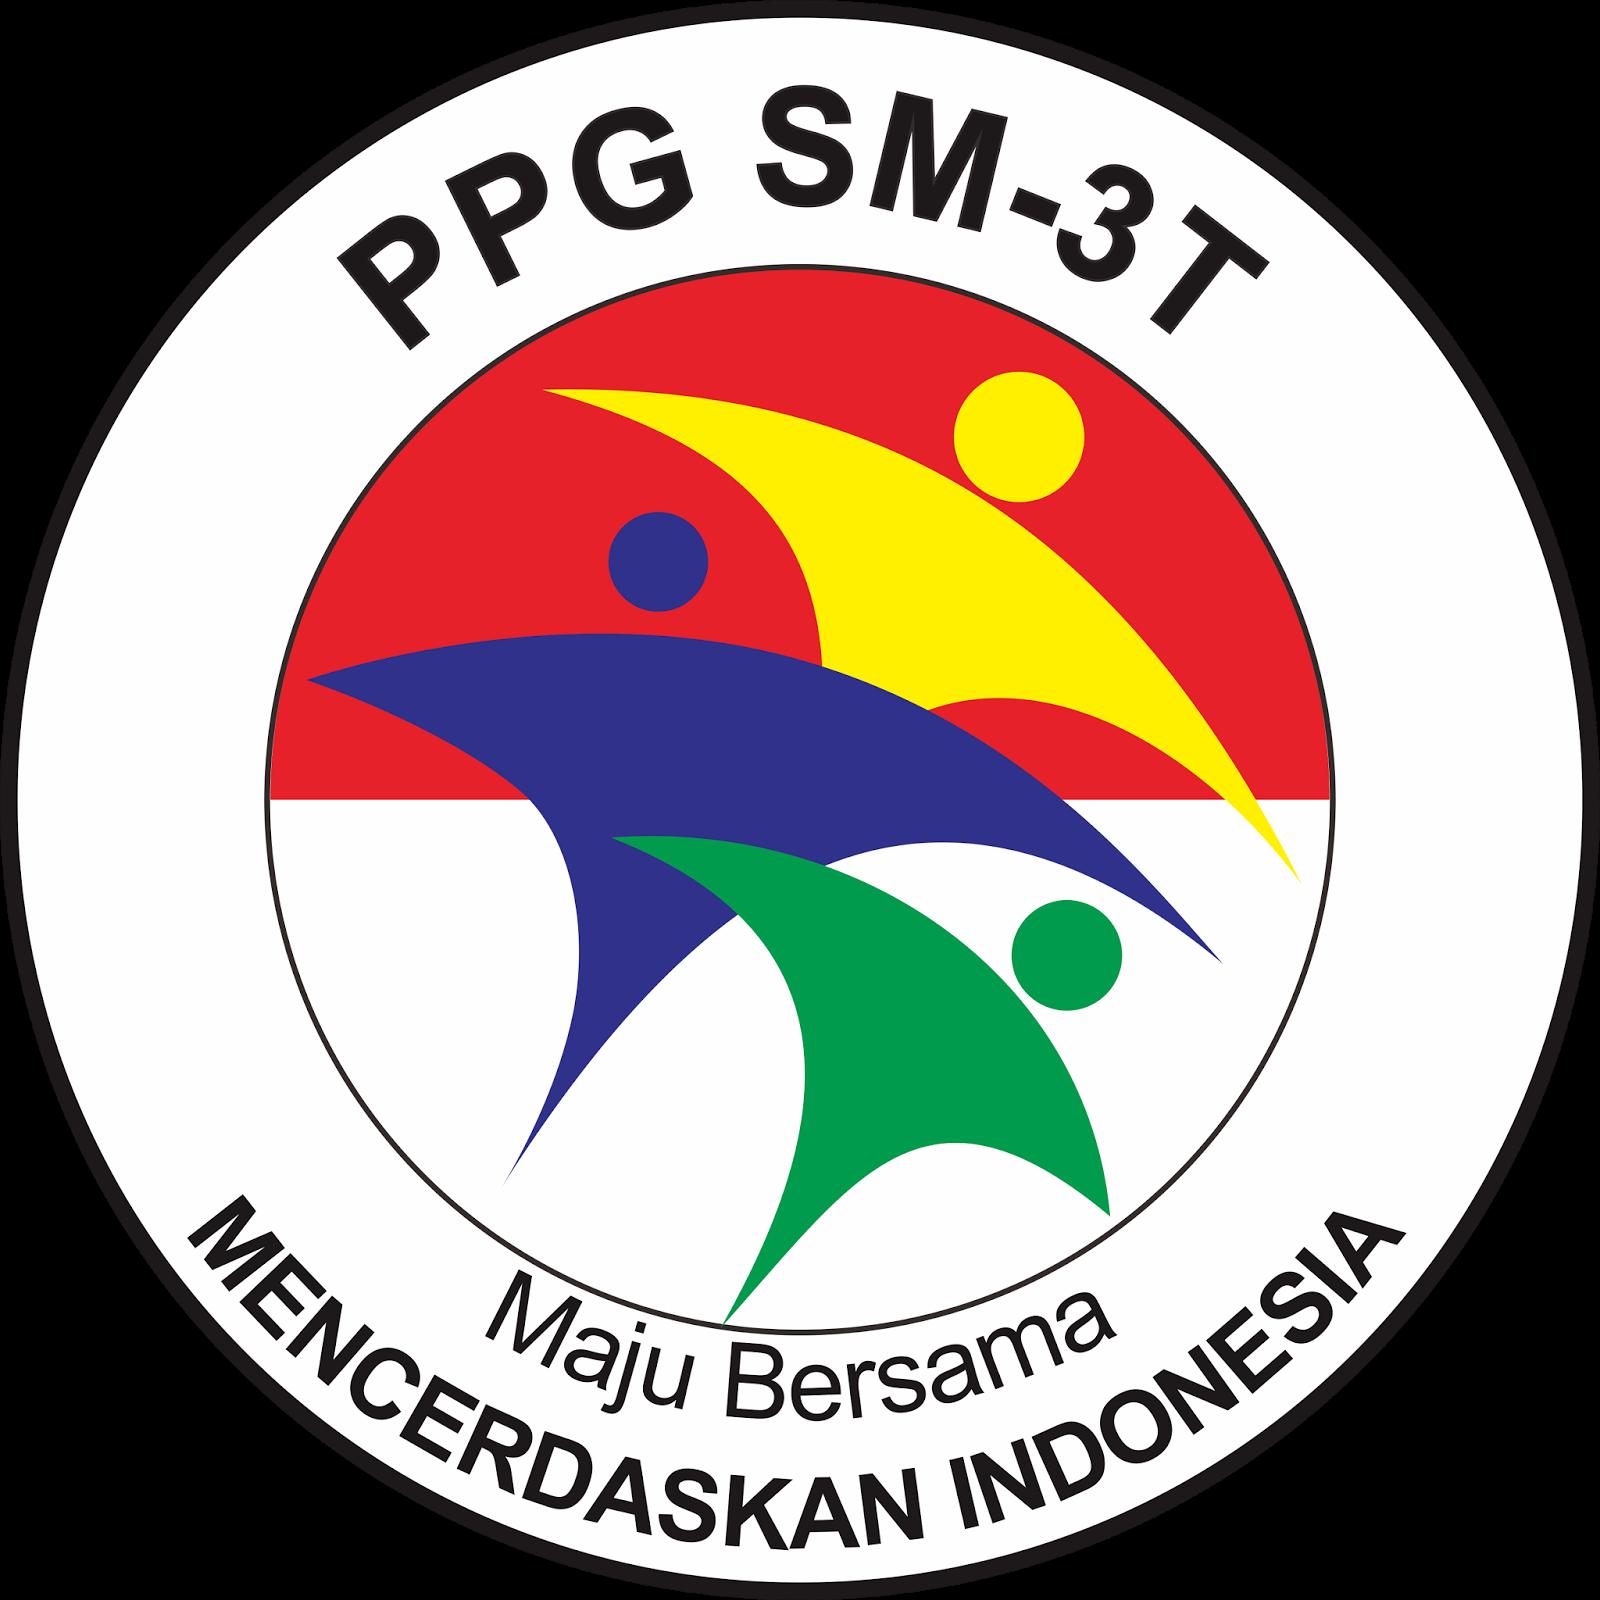 Program SM3T Jalan Pintas Untuk Jadi PNS